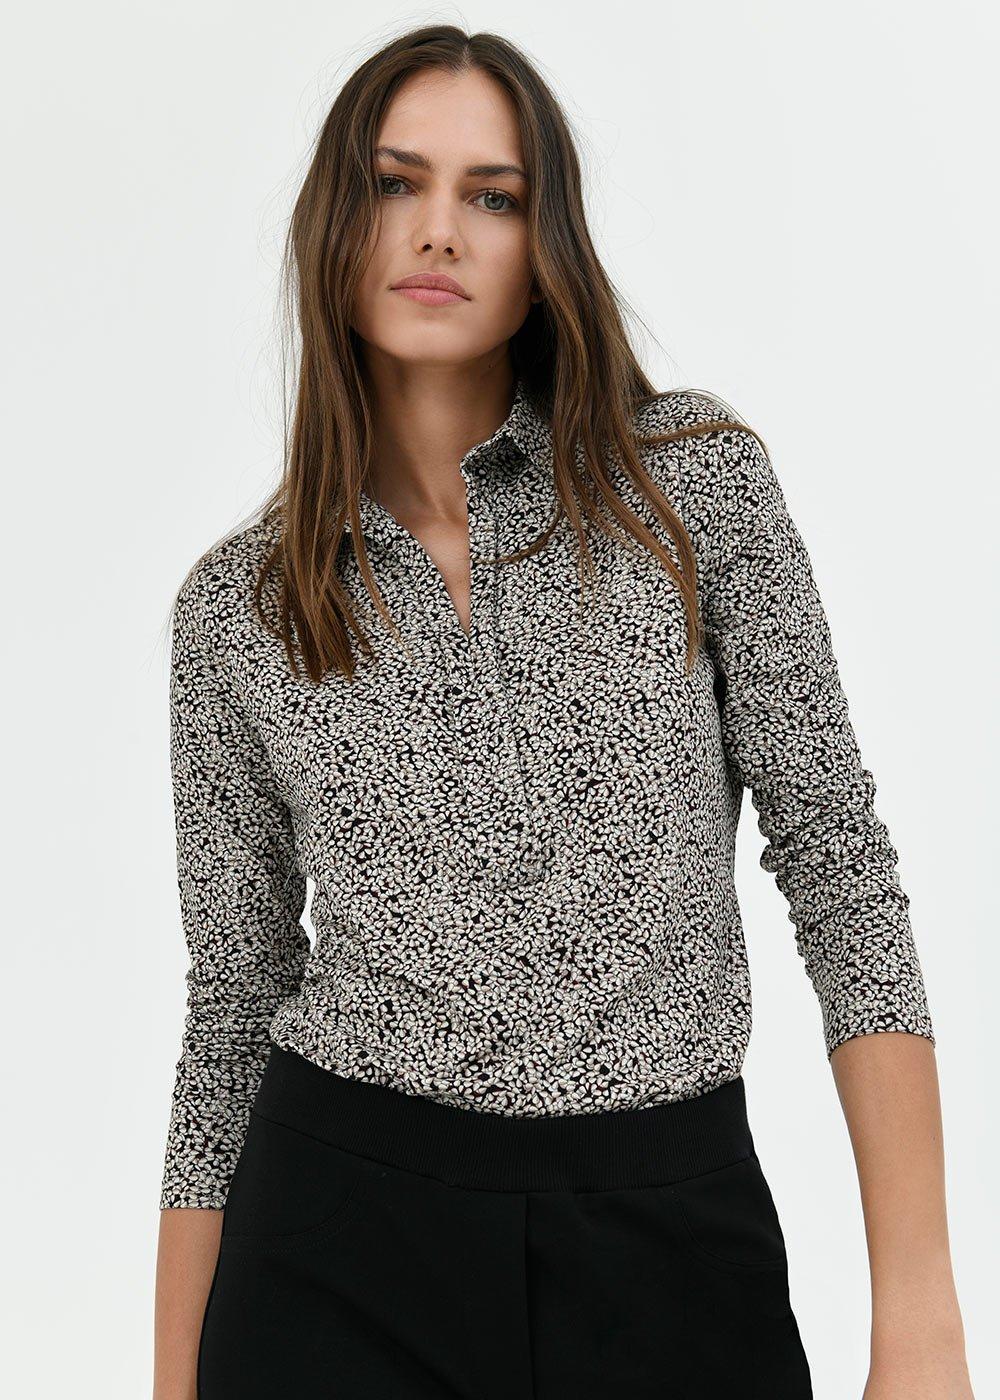 Sheyla t-shirt with collar - Black / White / Multi - Woman